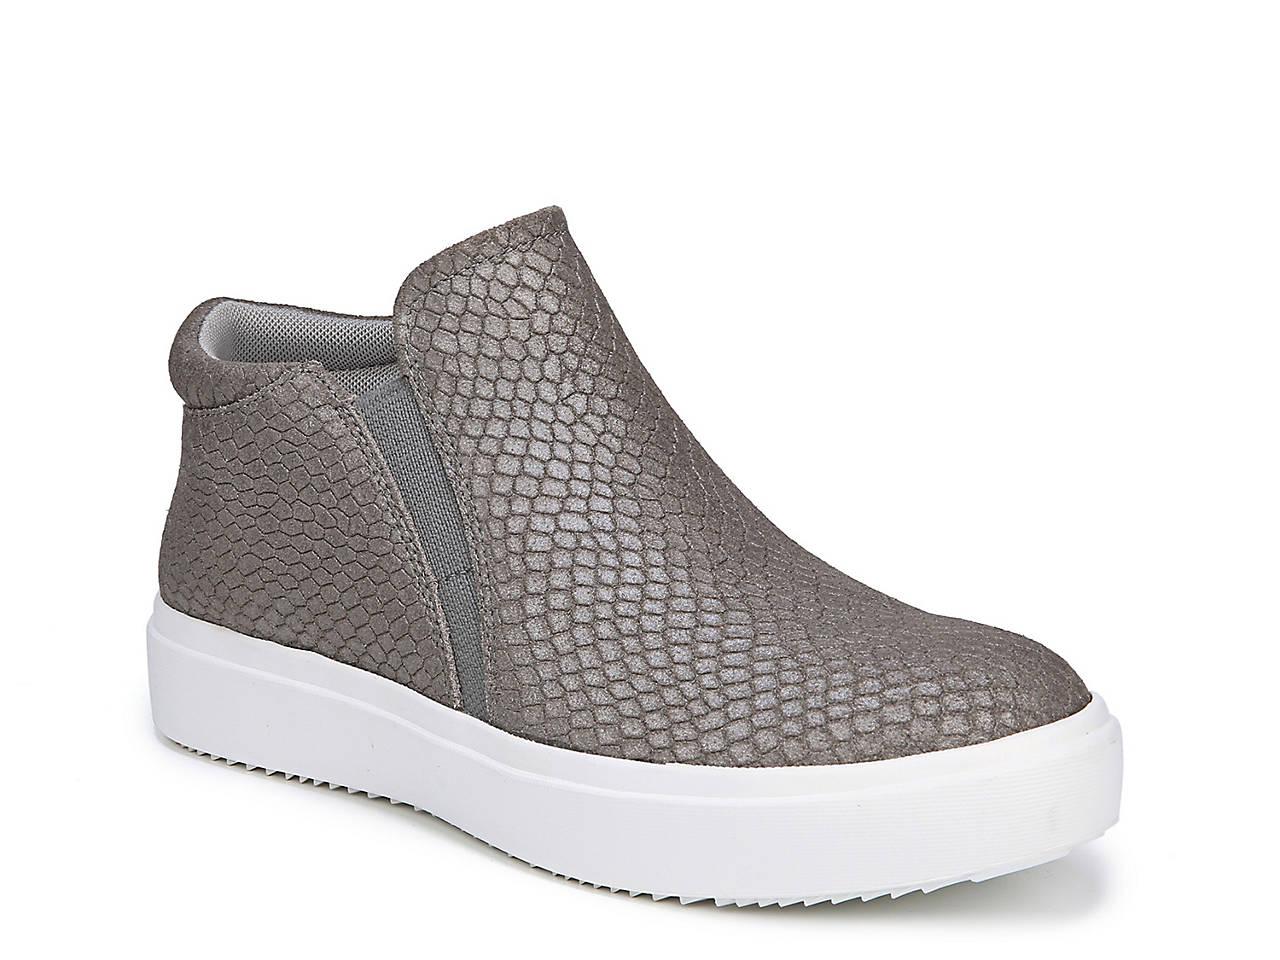 1da492a86cd Dr. Scholl s Leta Platform Slip-On Sneaker Women s Shoes